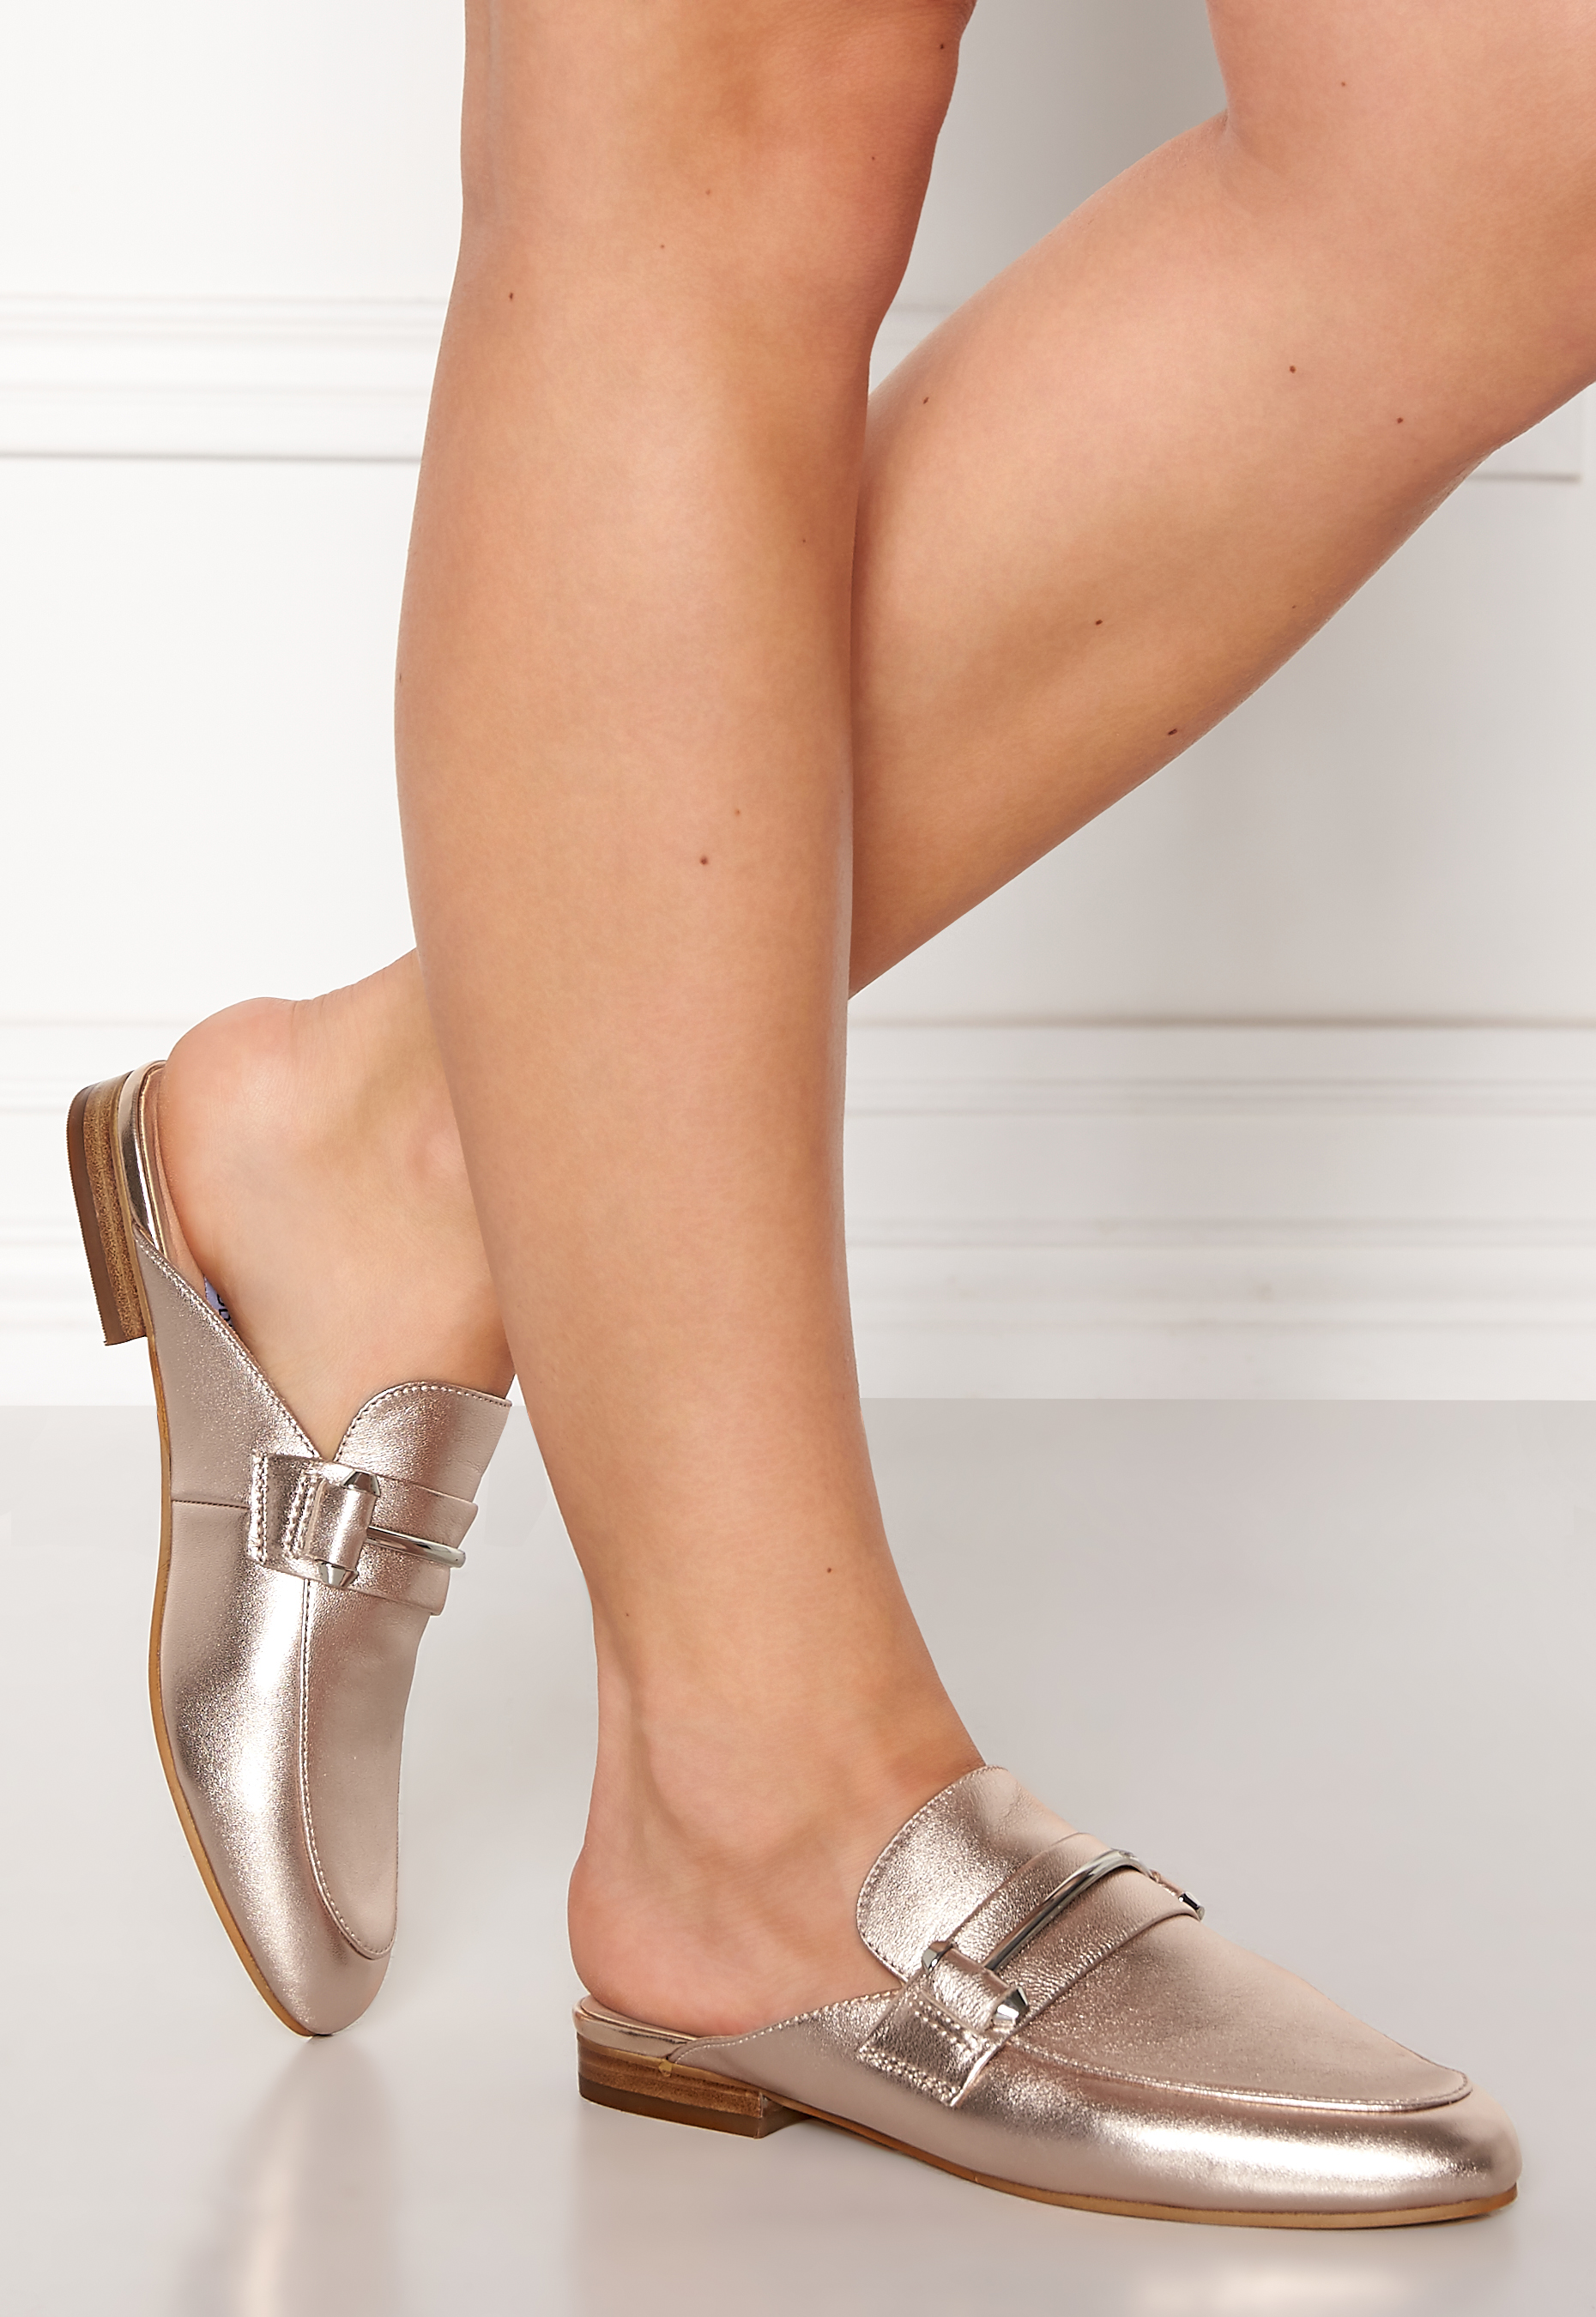 2b244e2dd33 Steve Madden Kera Mule Leather Shoes Rose Gold - Bubbleroom